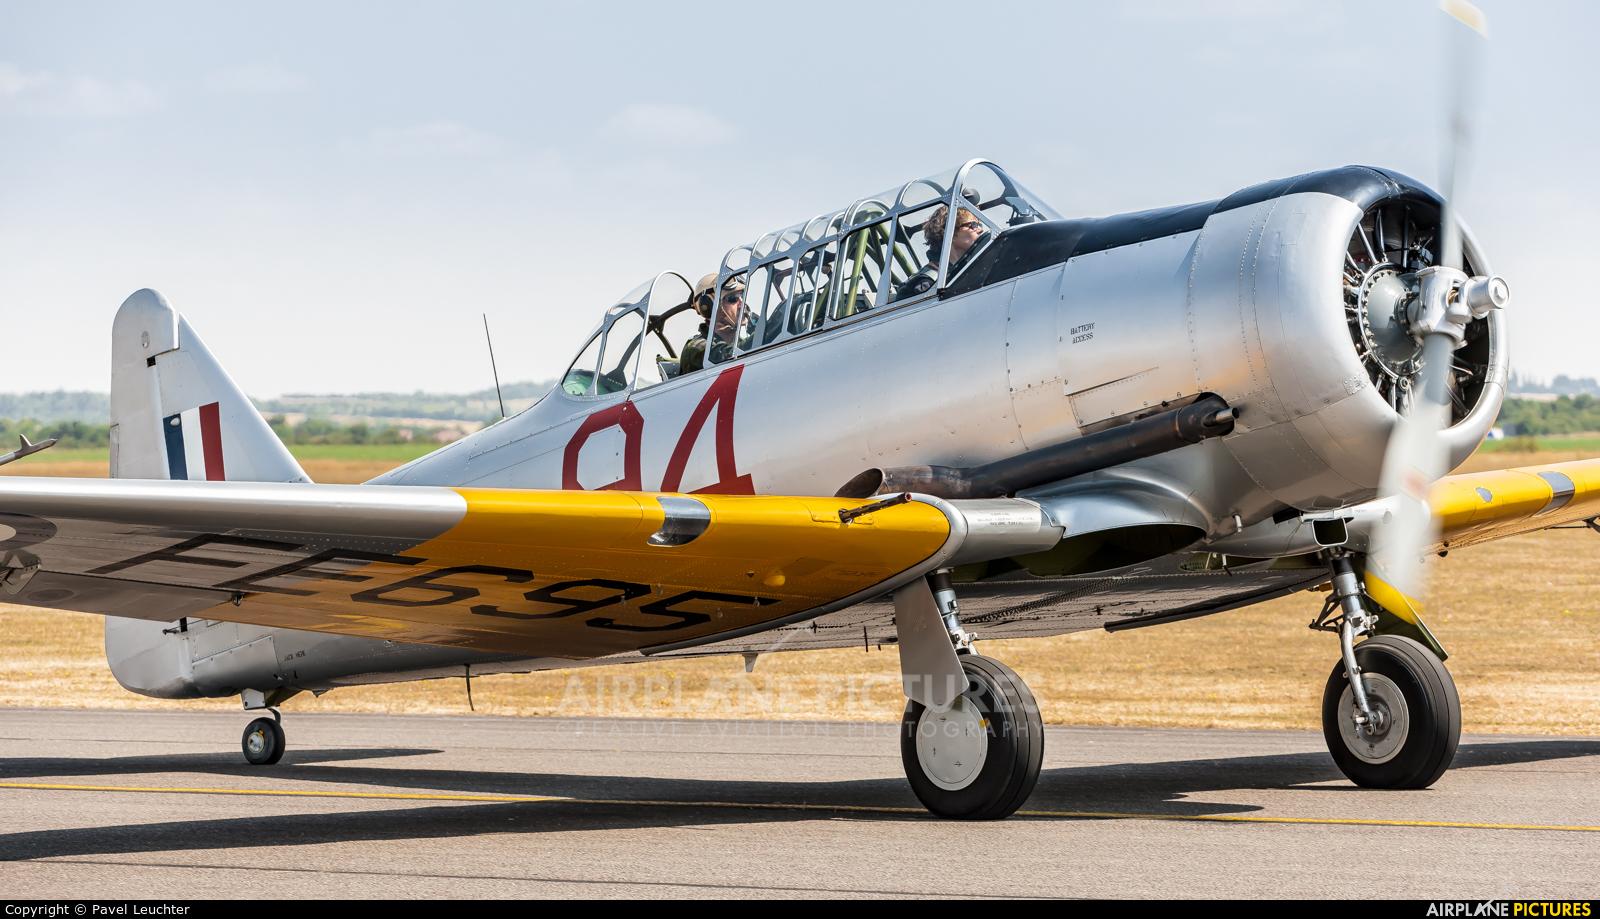 Patina G-BTXI aircraft at Duxford